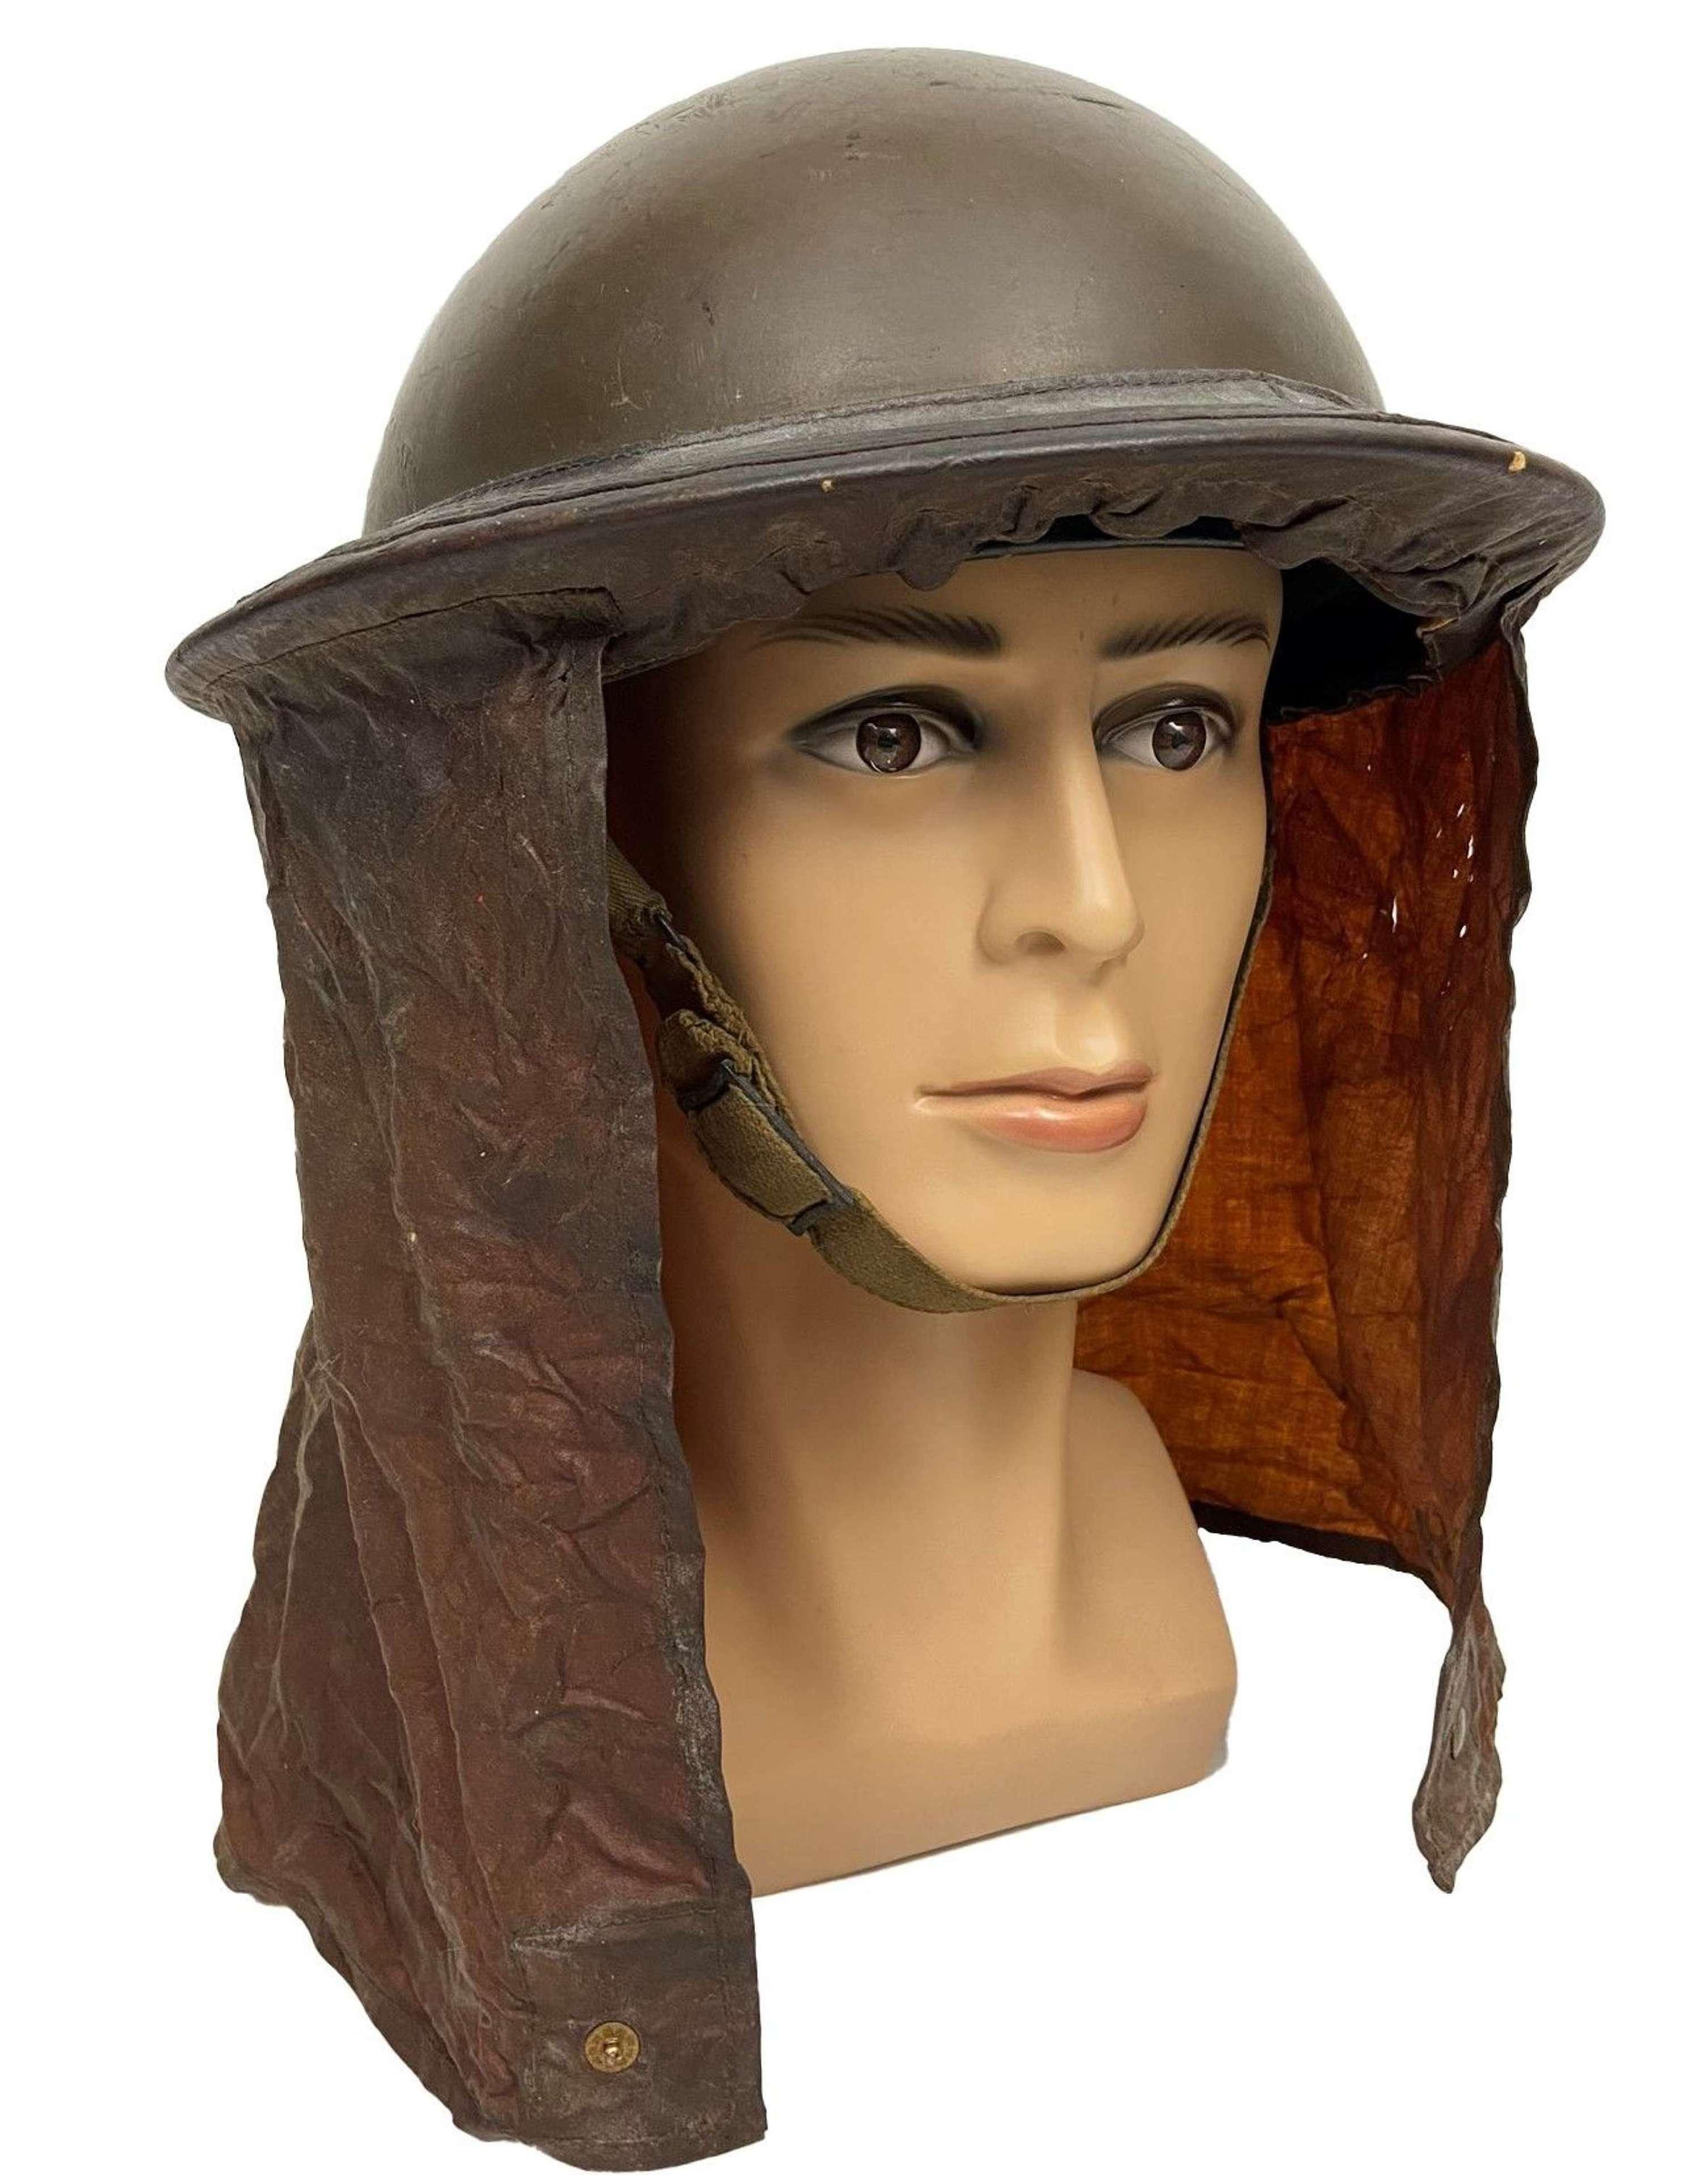 Scarce 1938 Dated British MKII Steel Helmet + 1939 Dated Gas Curtain